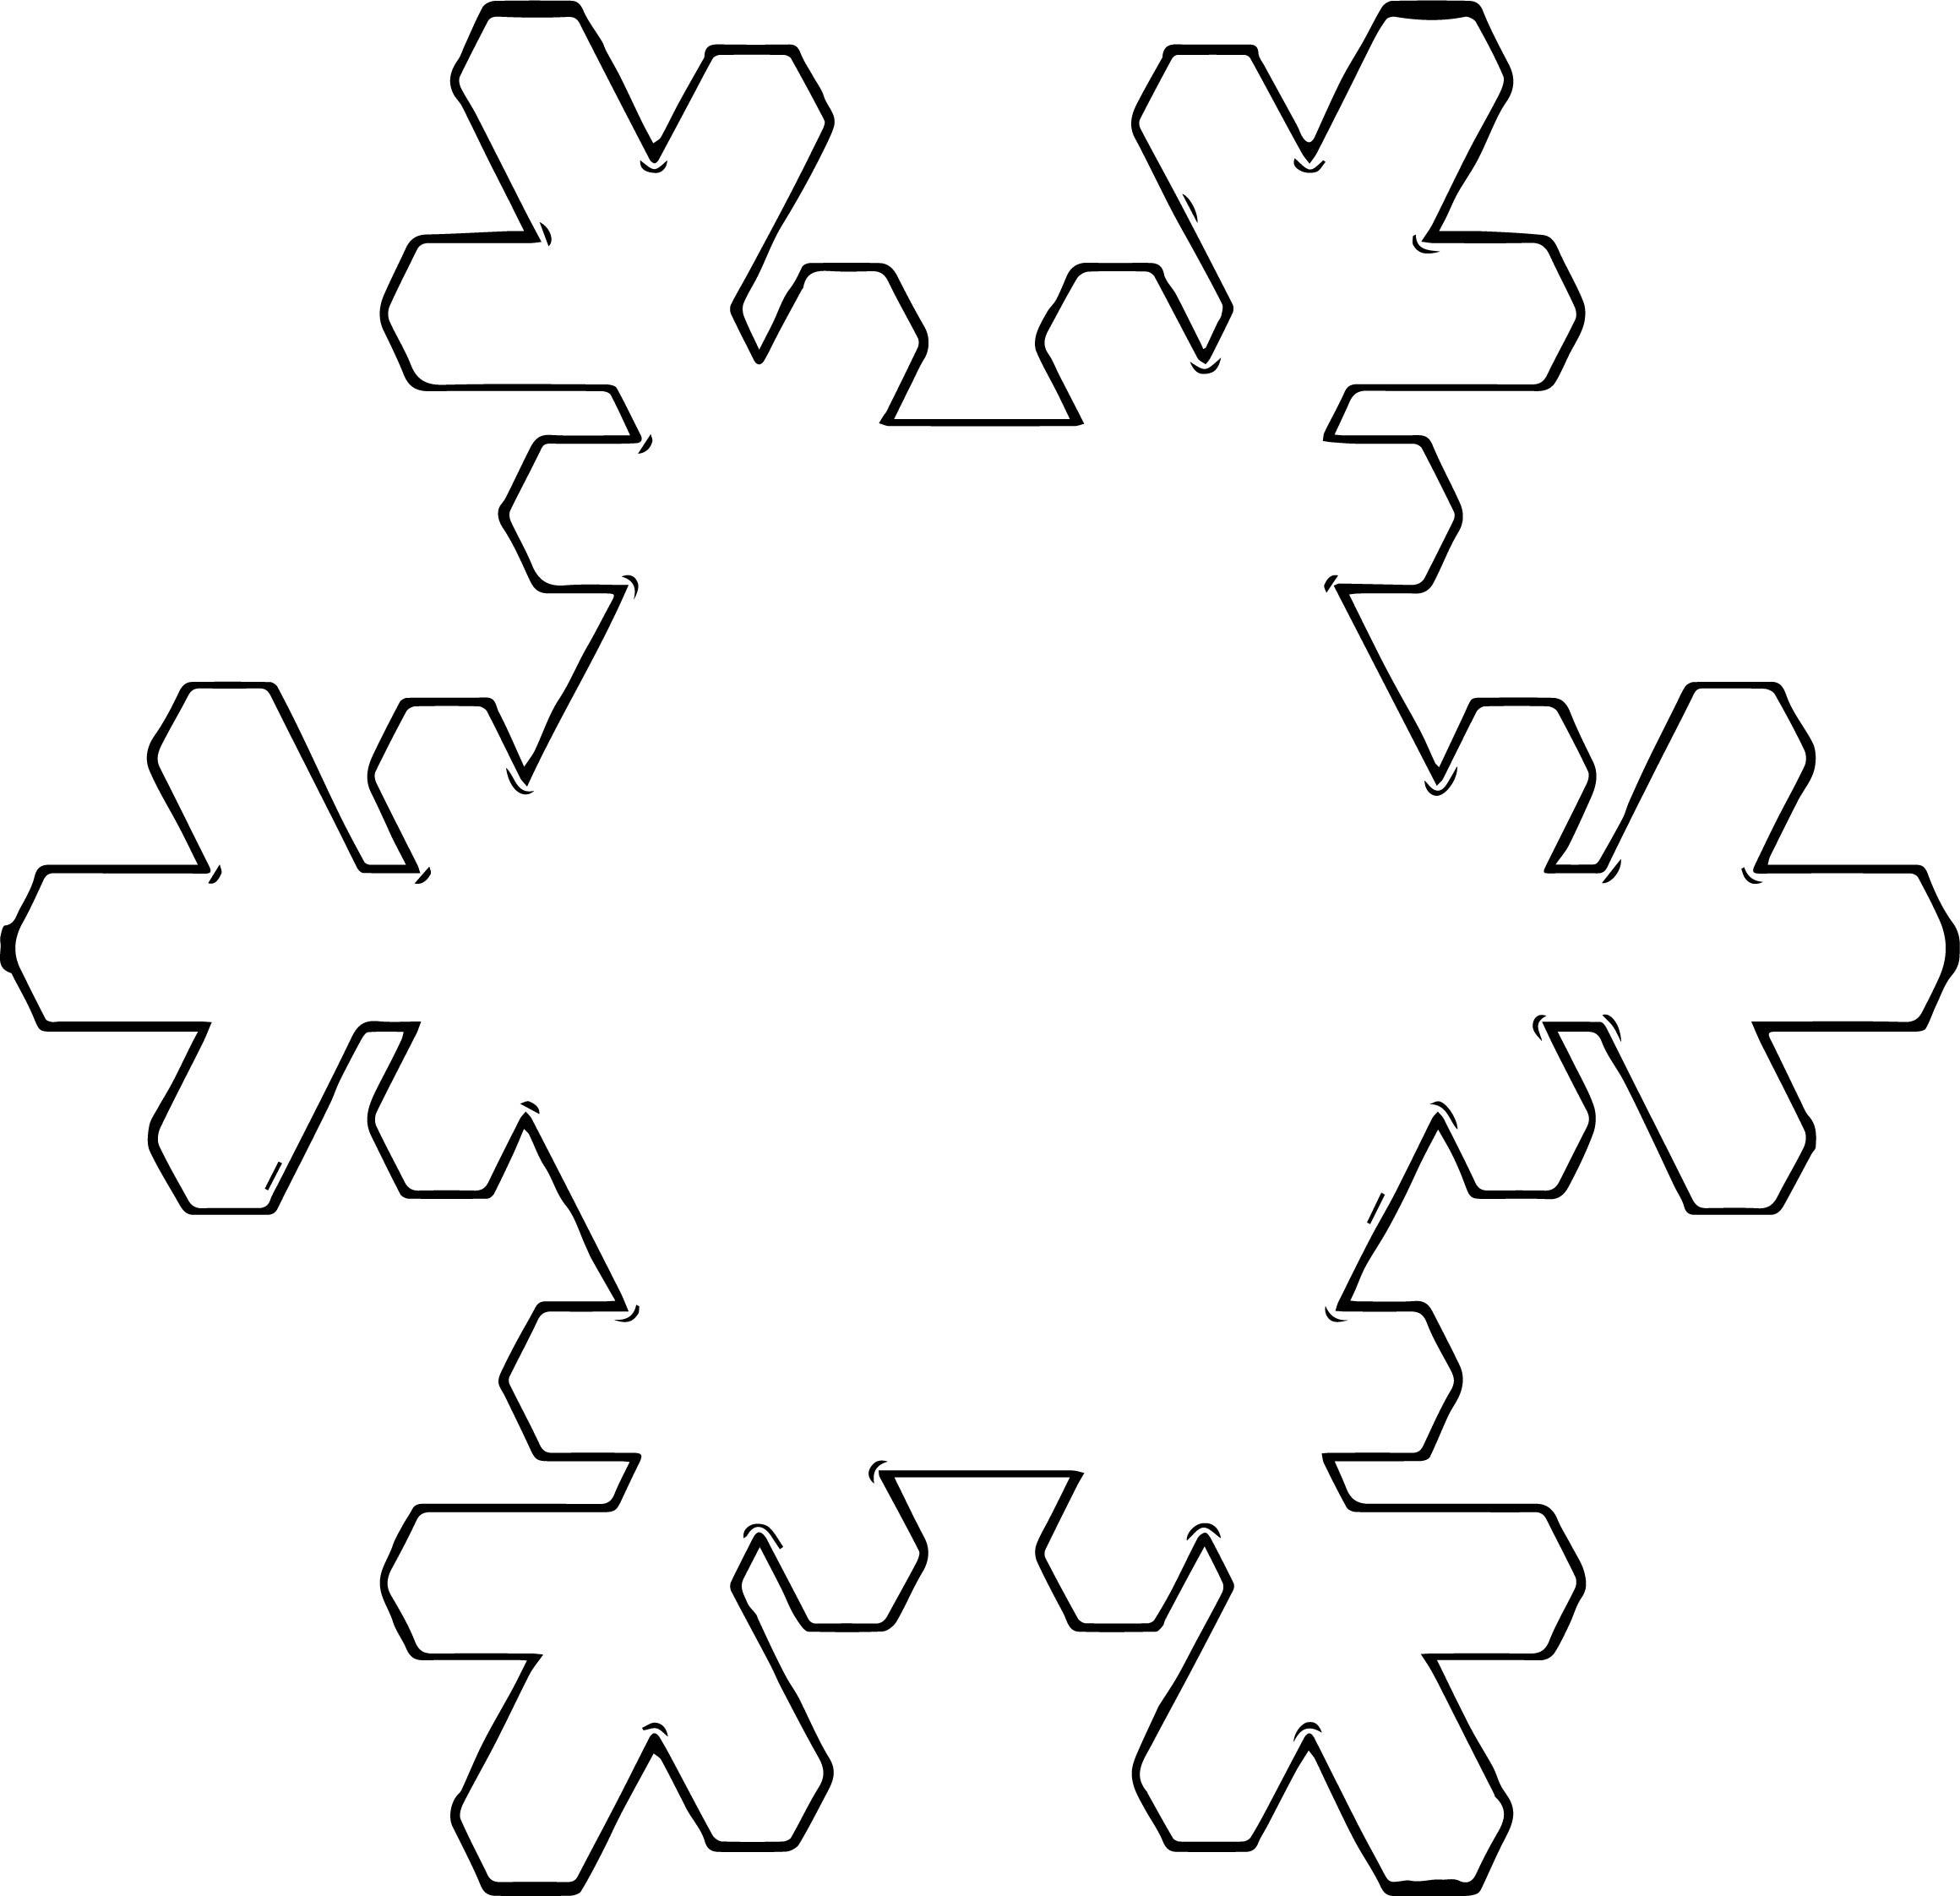 Snowflake Coloring Page WeColoringPage 33 | Wecoloringpage.com